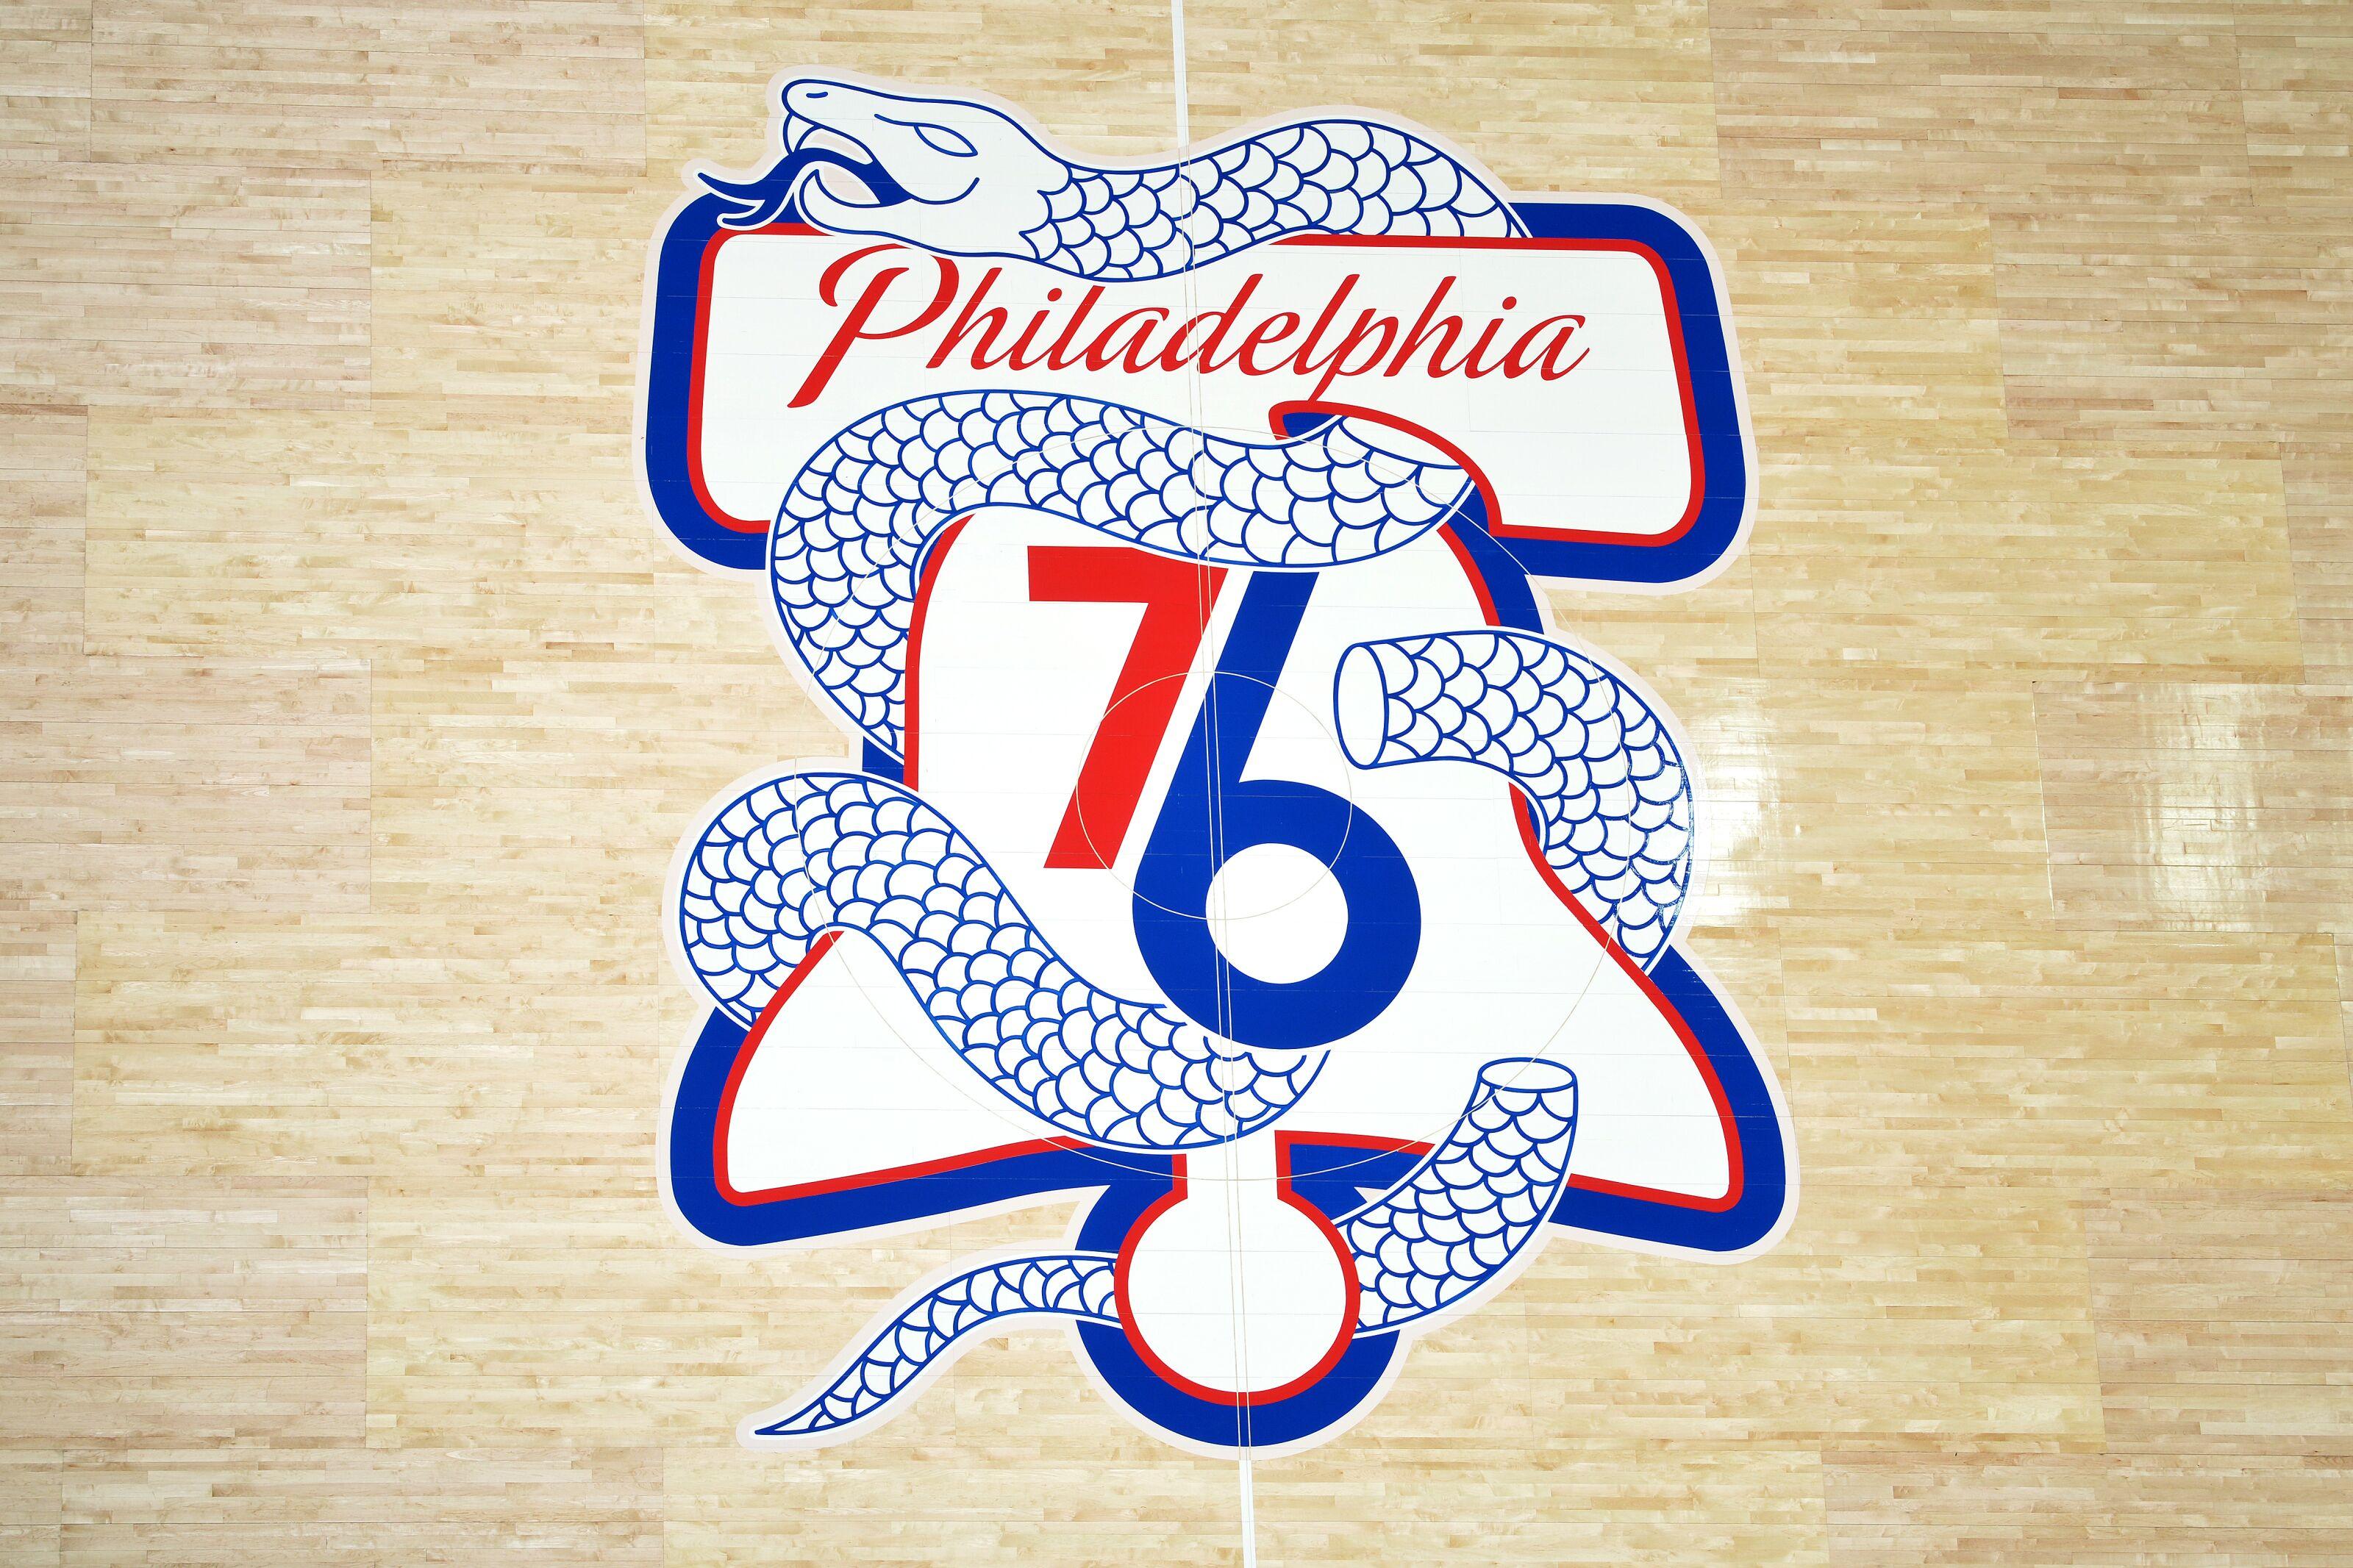 Philadelphia 76ers Hoops, Hype and History: Branding the Sixers